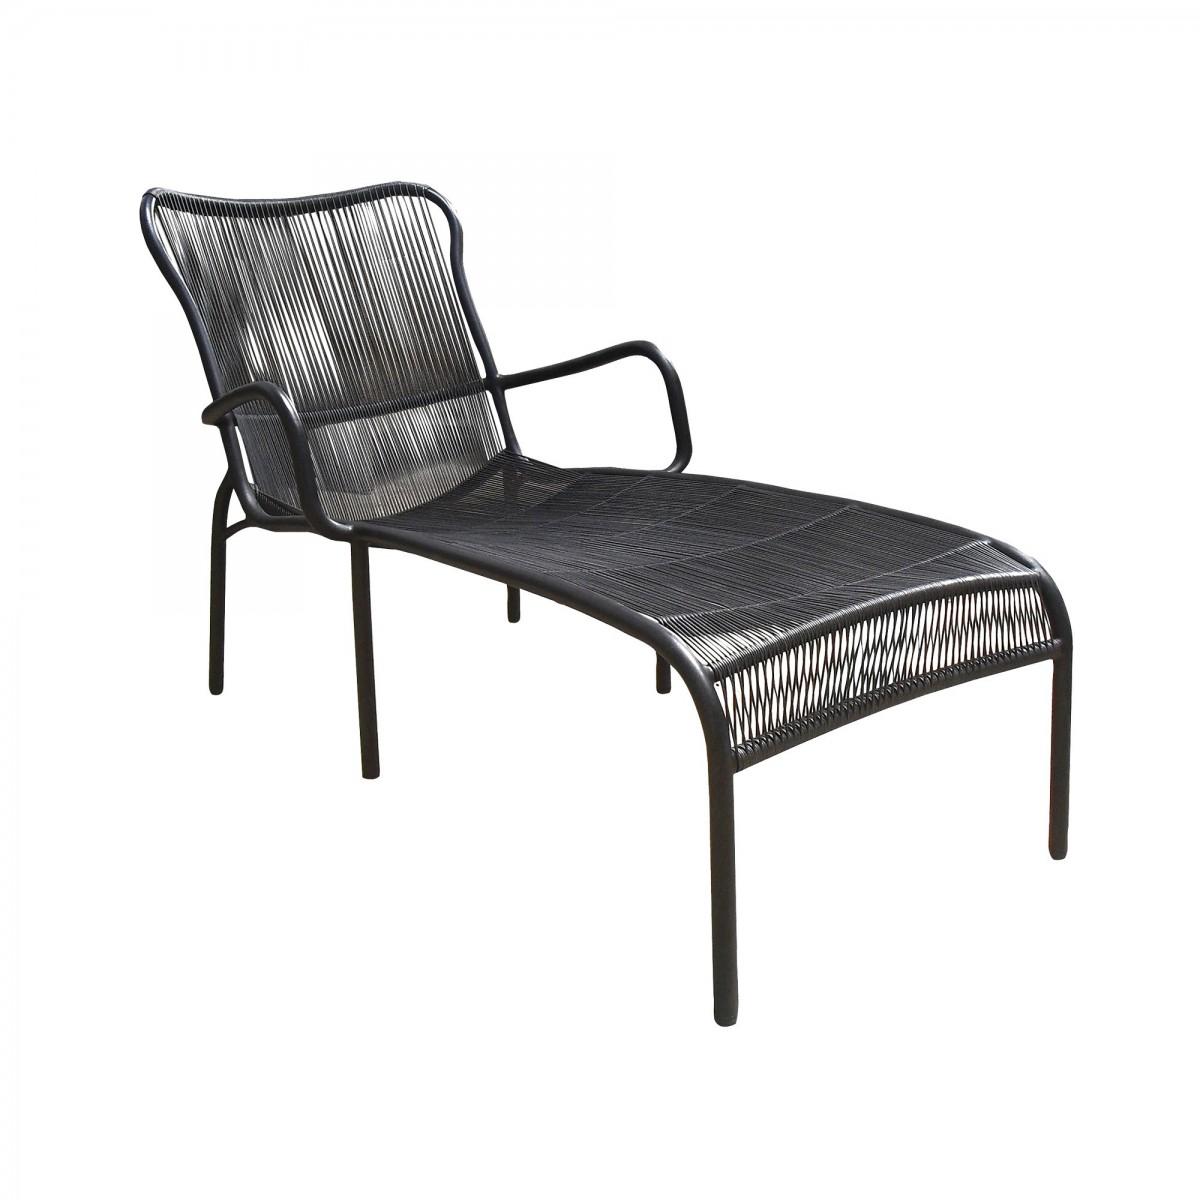 loop chaise longue black 30 Bon Marché Chaise Médaillon Uqw1